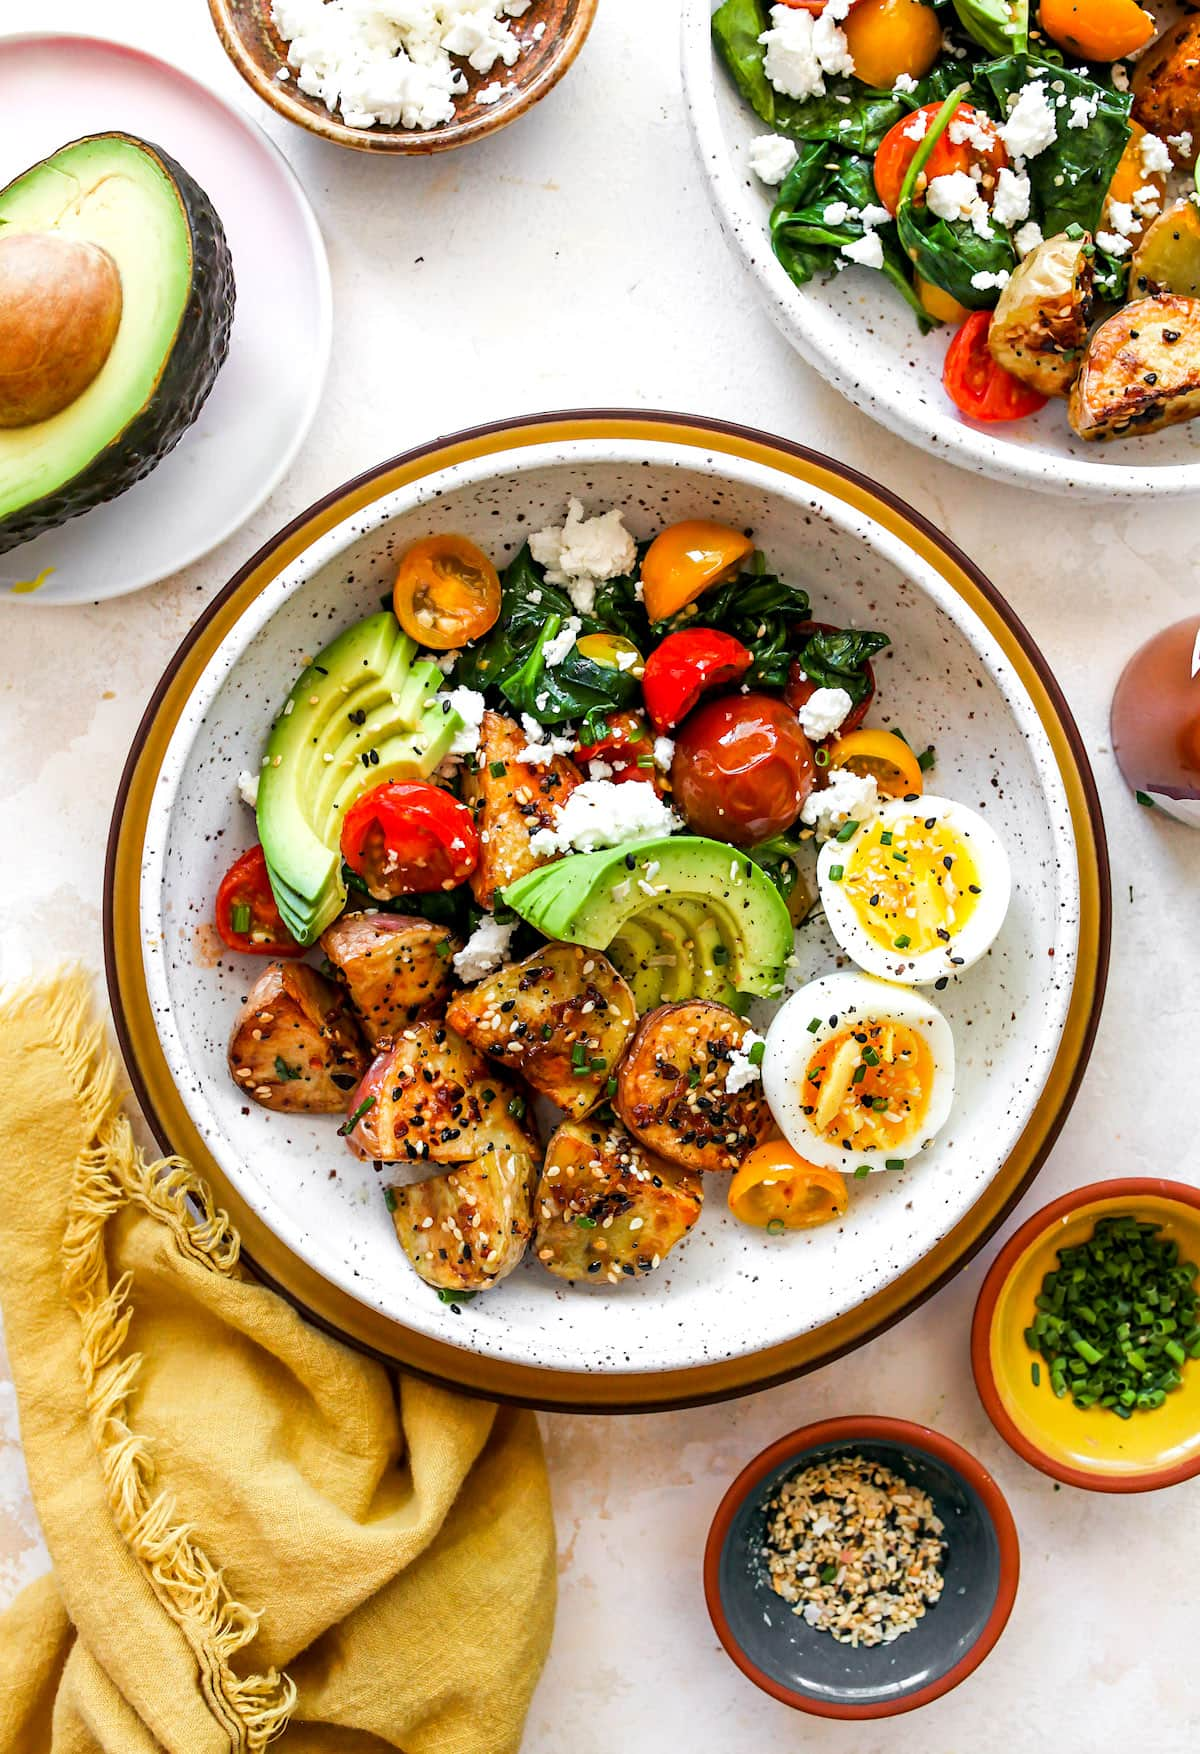 Savory Breakfast Bowl {Healthy} - Two Peas & Their Pod